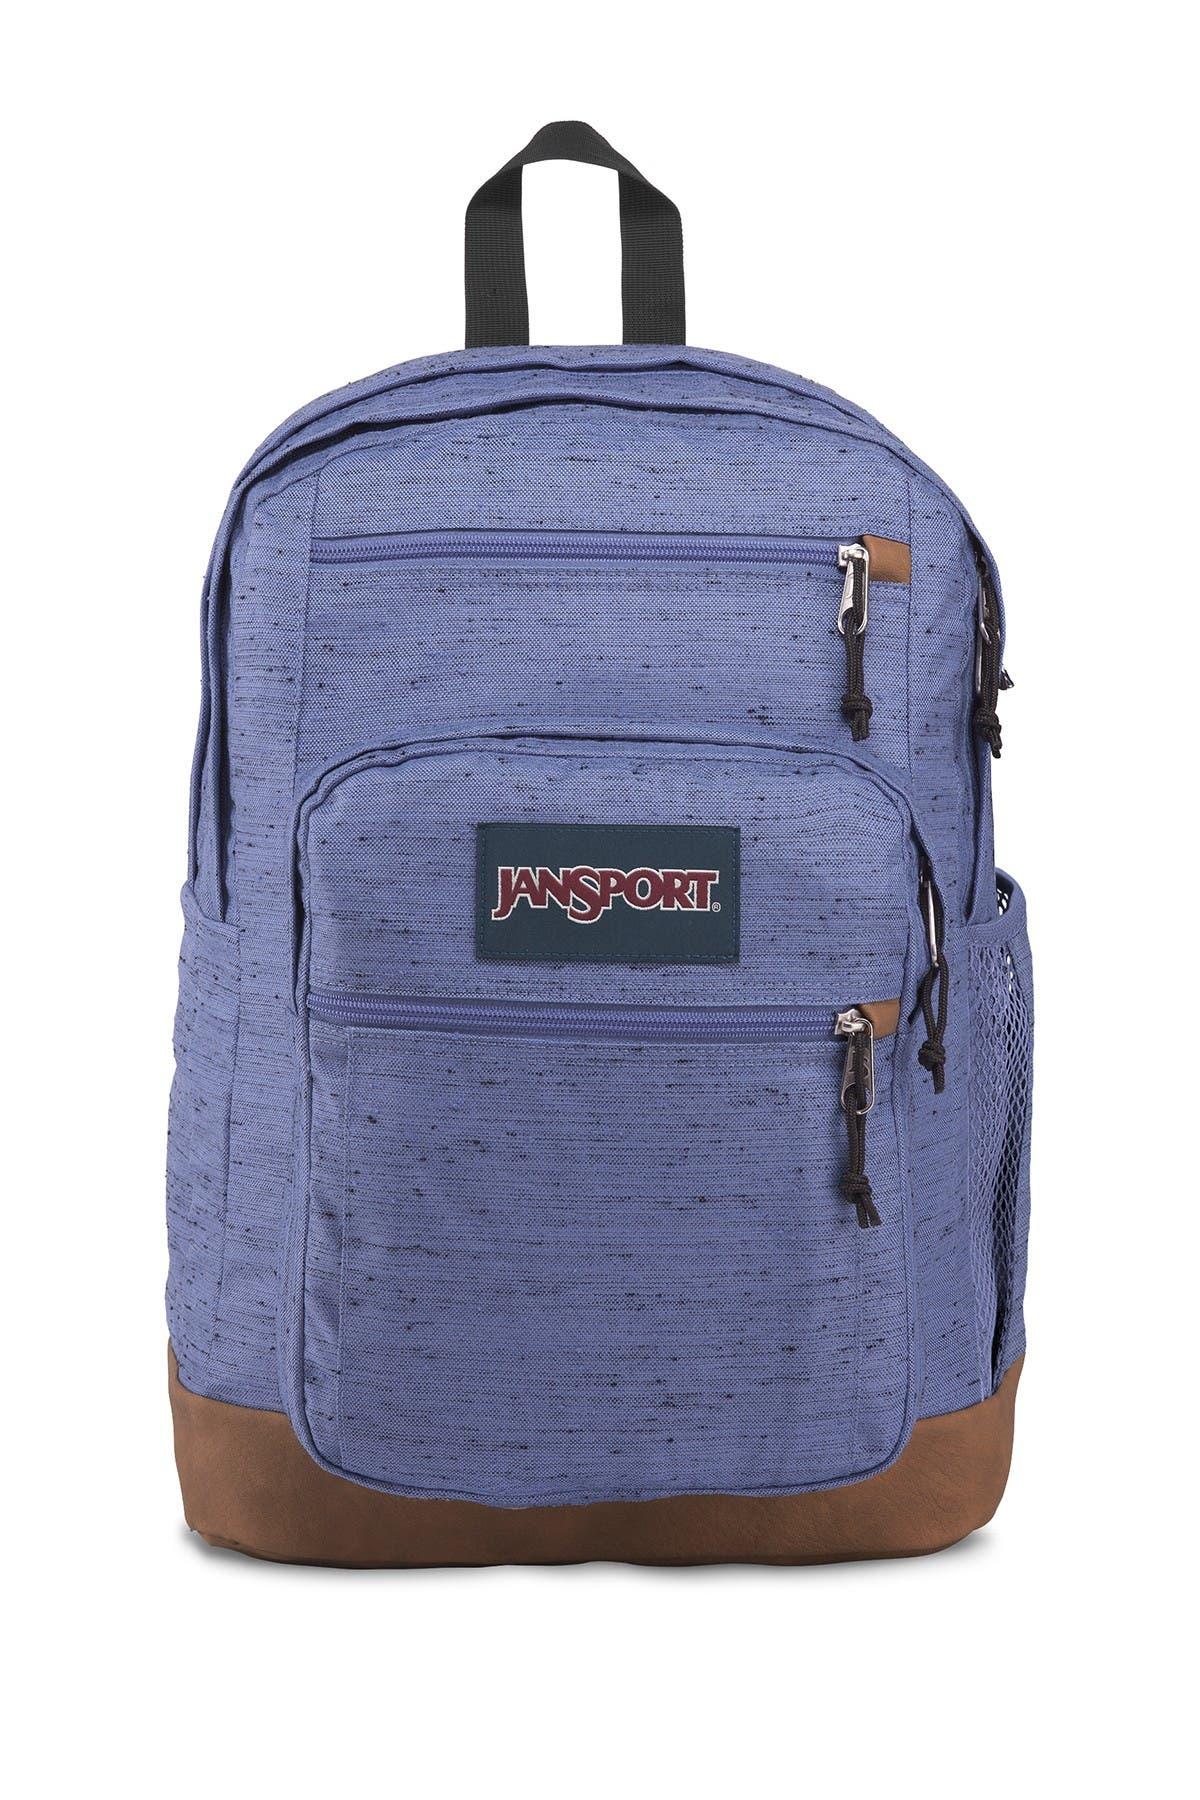 Image of JANSPORT Cool Student Backpack